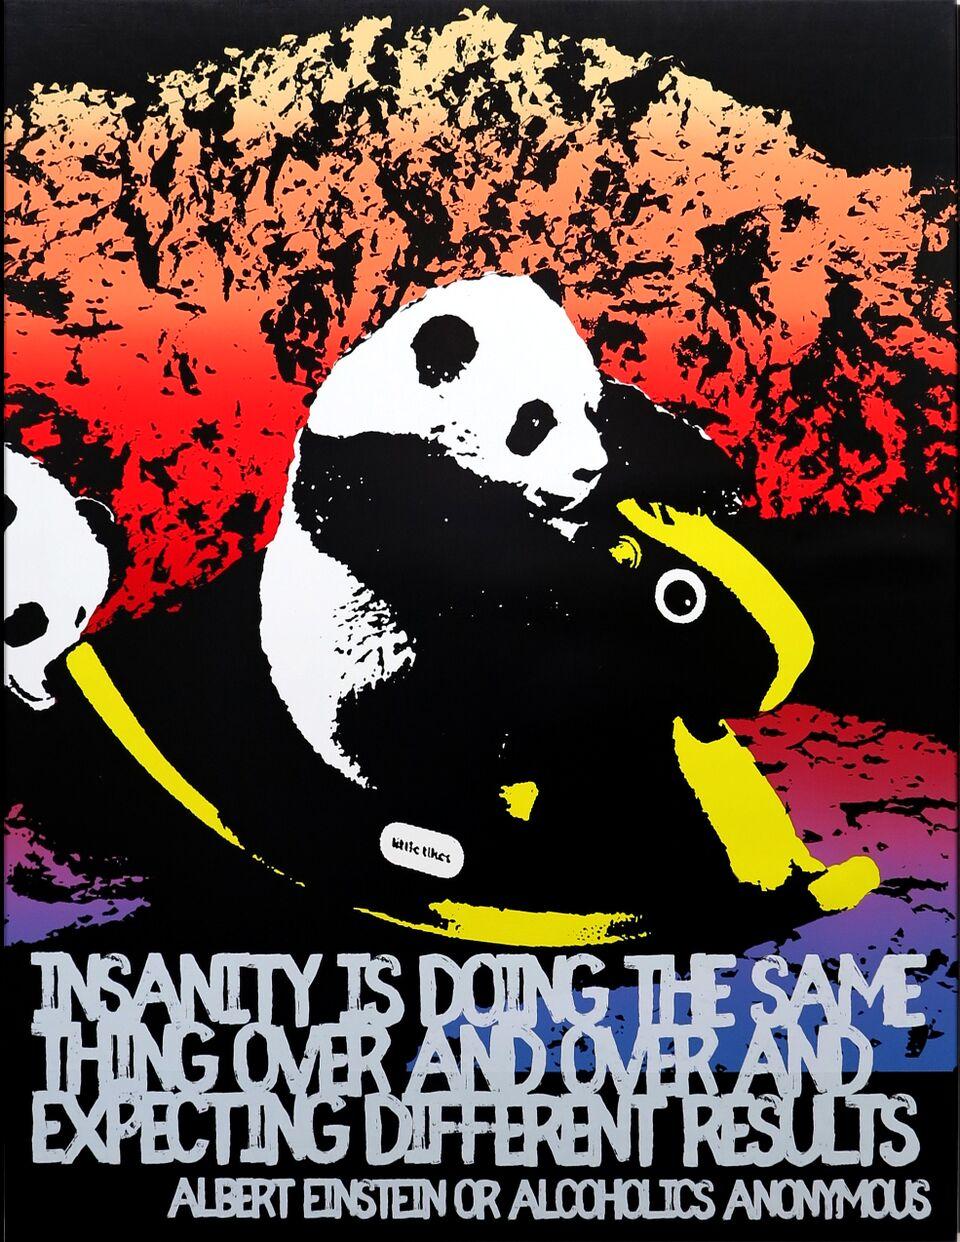 Motivational Panda (Albert Einstein/Alcoholics Anonymous)